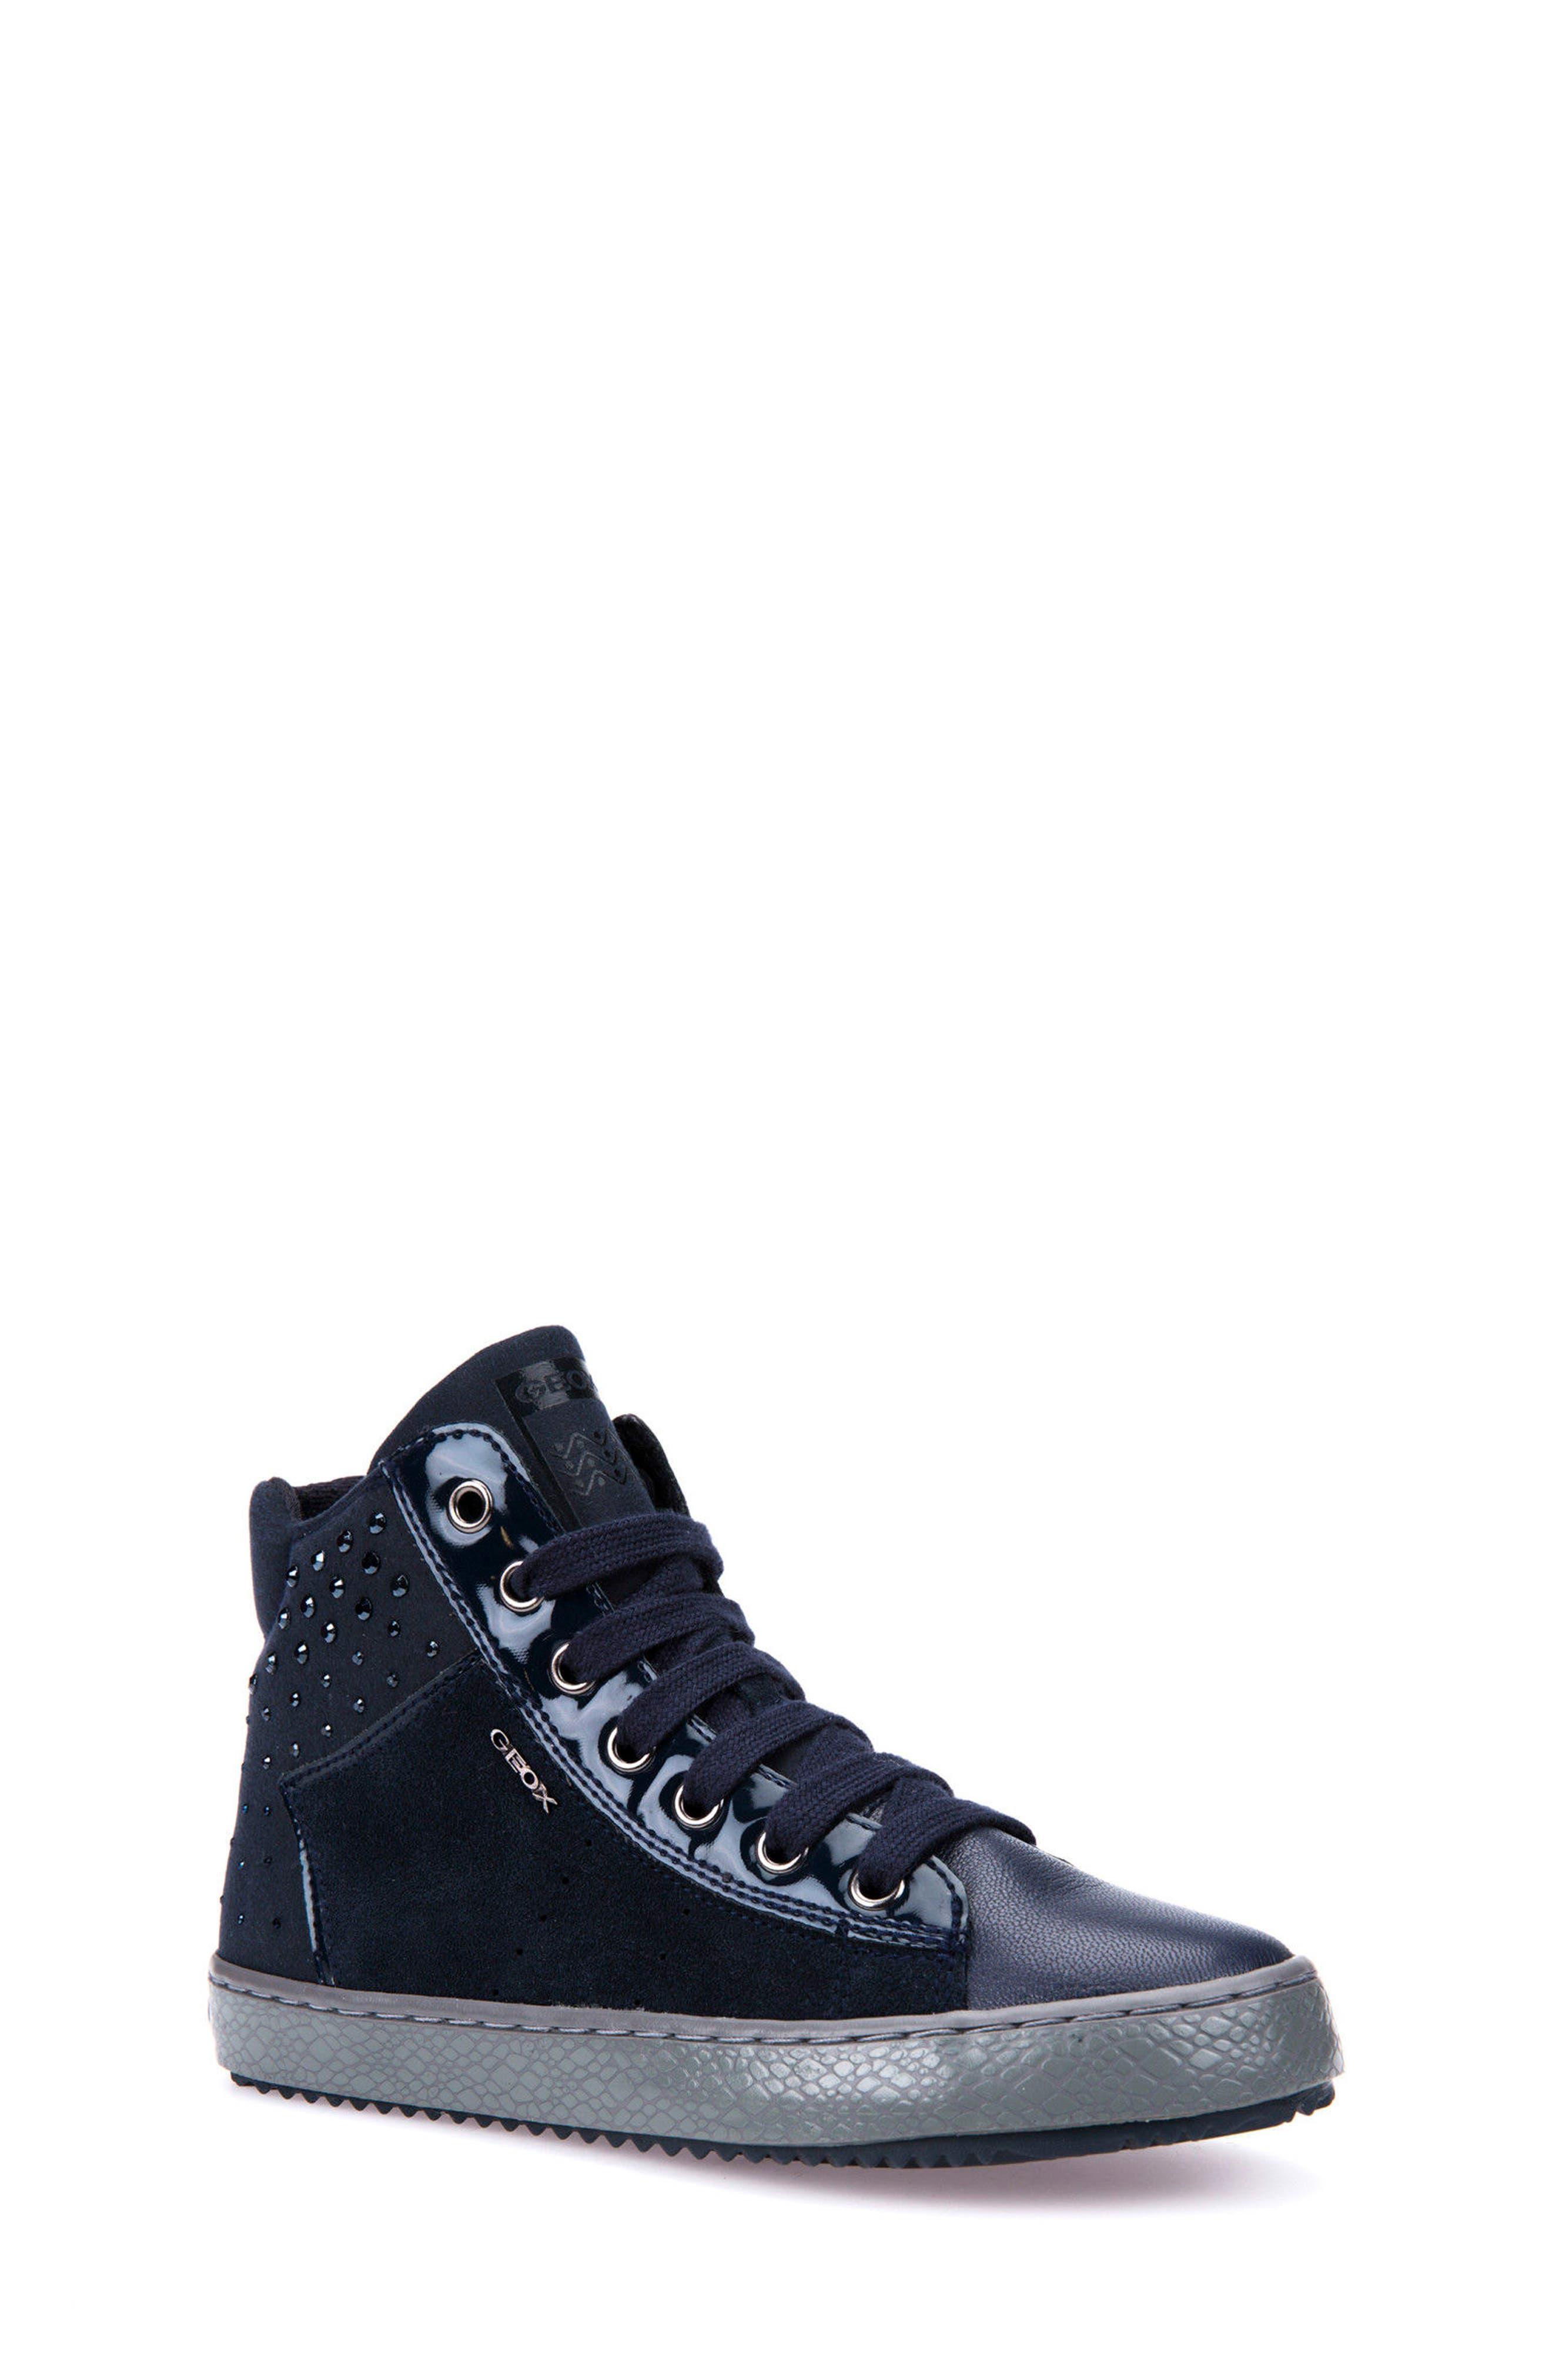 GEOX Kalispera Girl Embellished High Top Sneaker